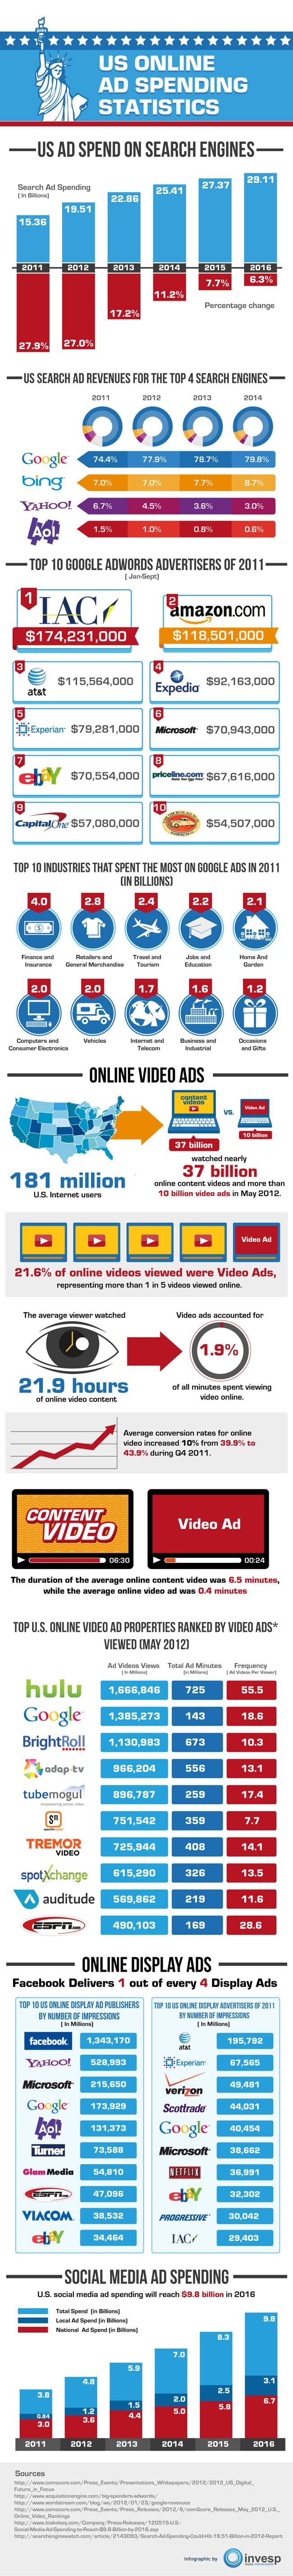 US Online Ad Spending Statistics